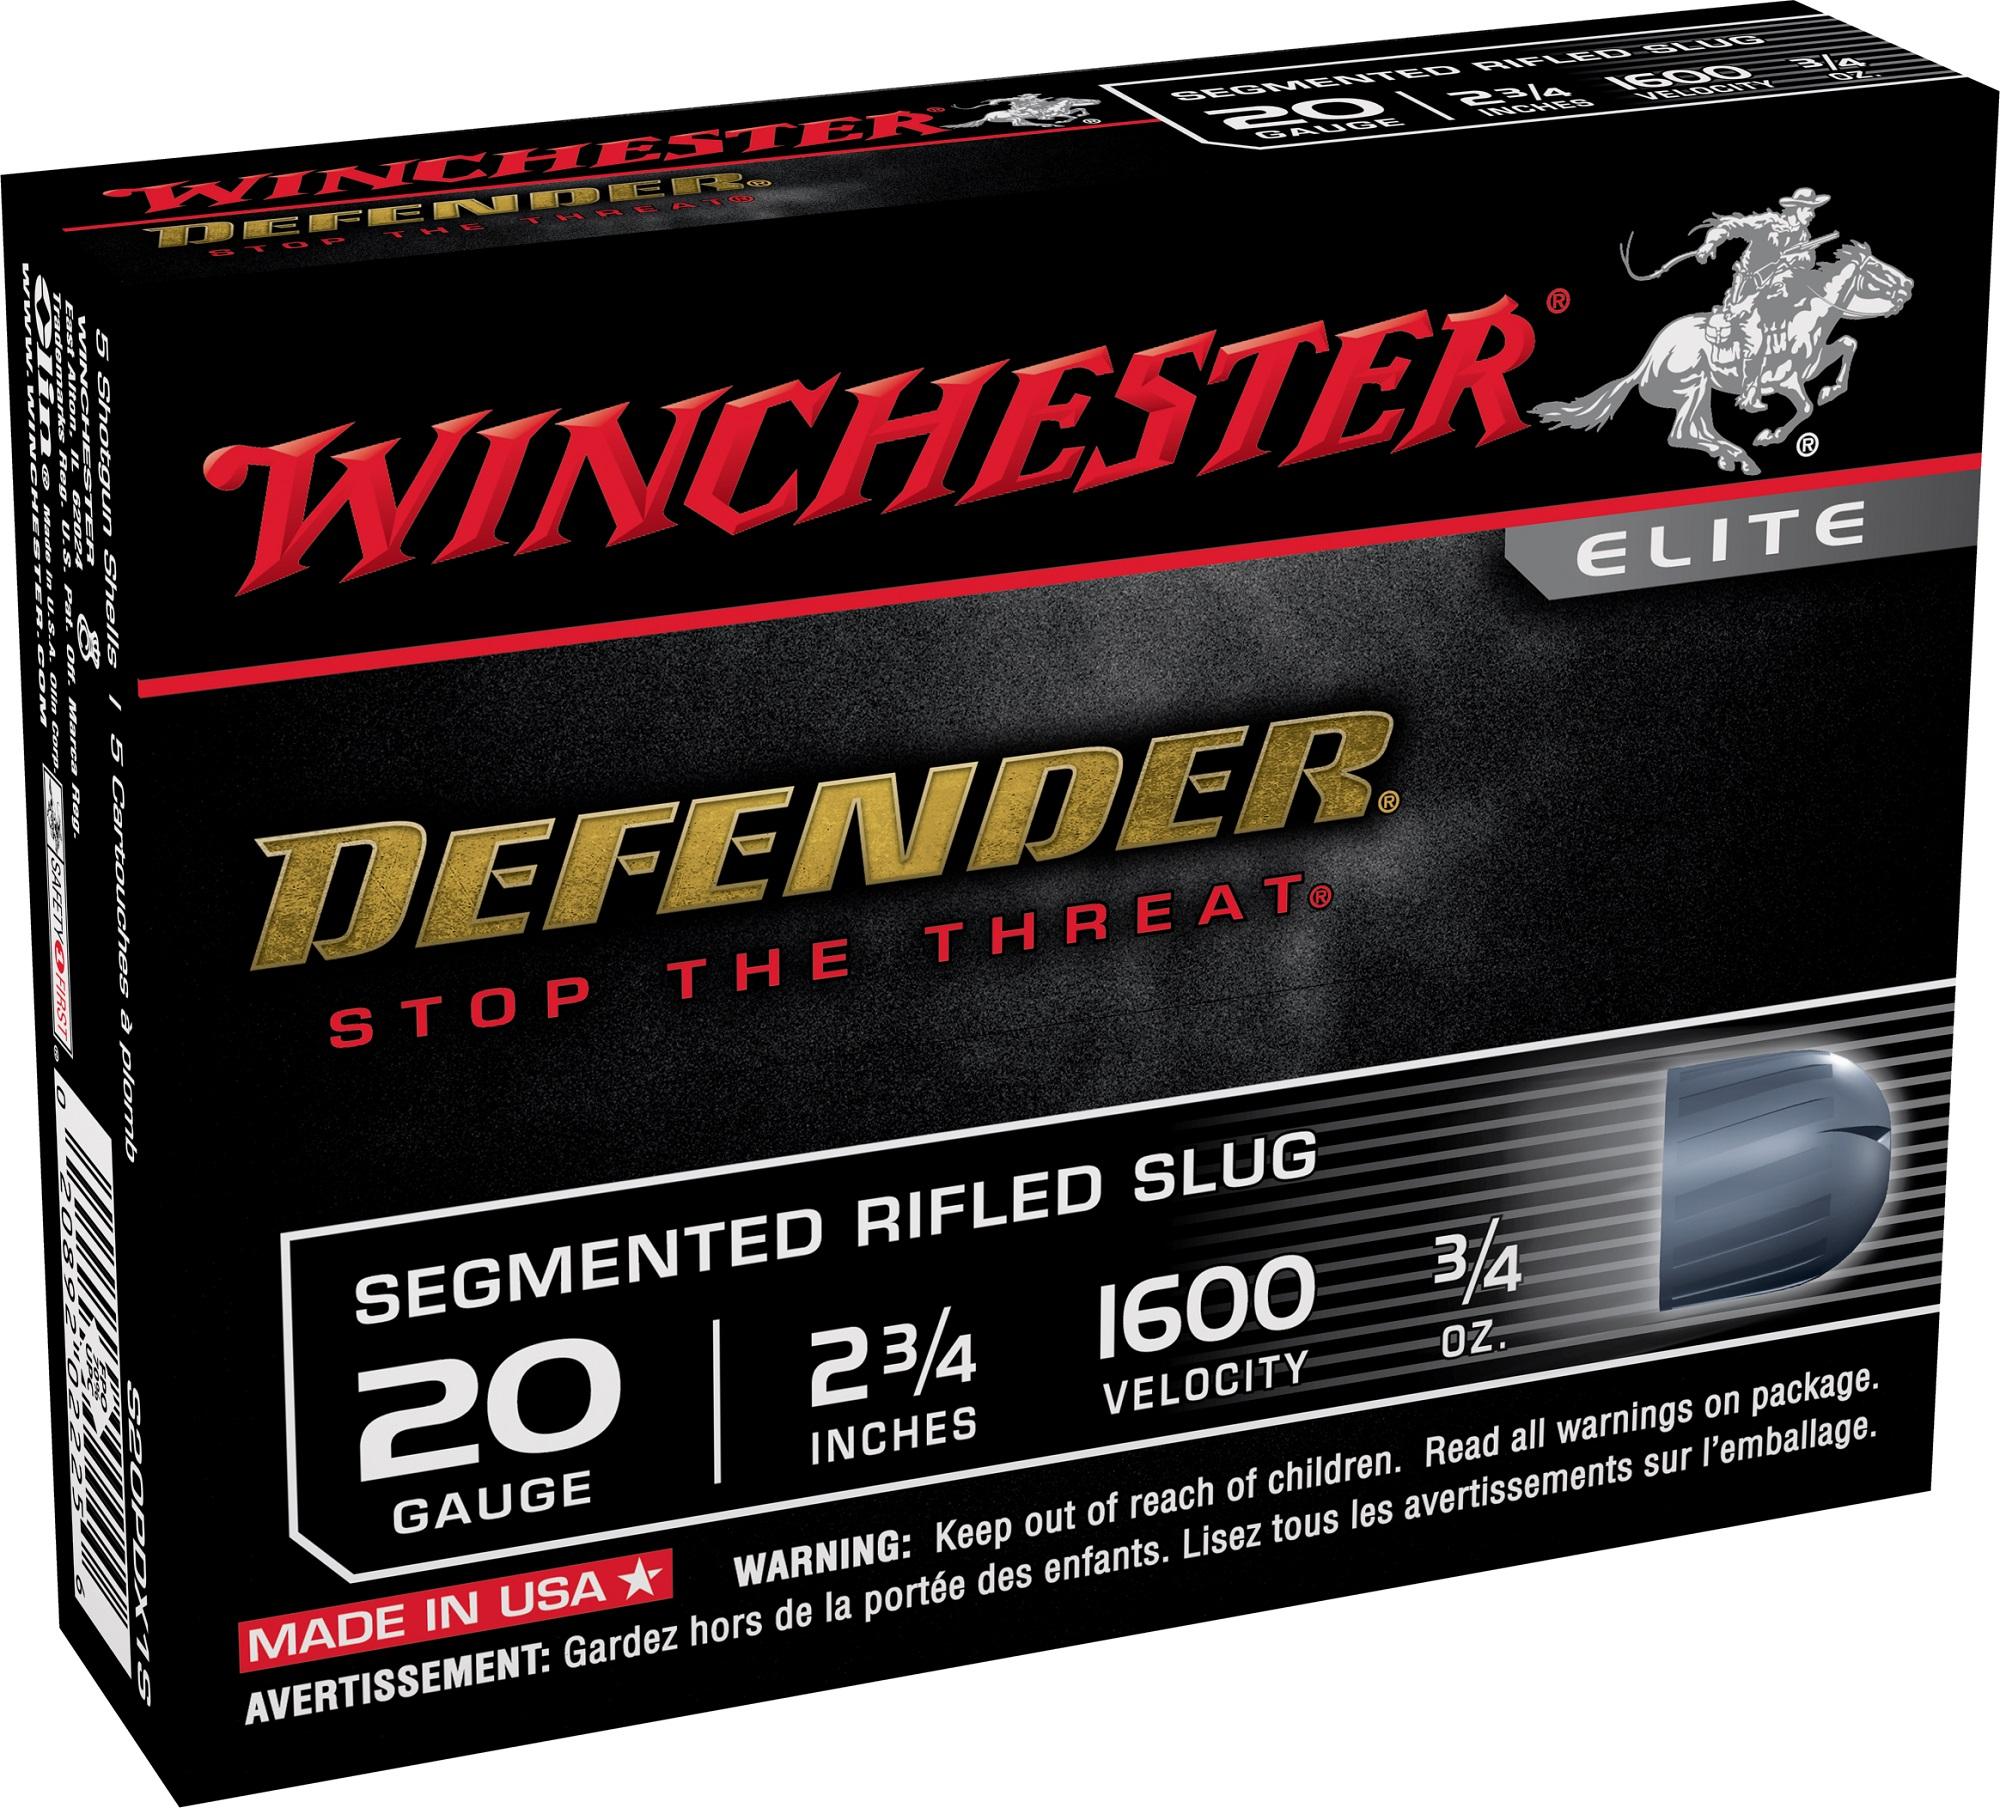 Winchester Pdx1 Defender 20 Gauge Segmenting Rifled Slug